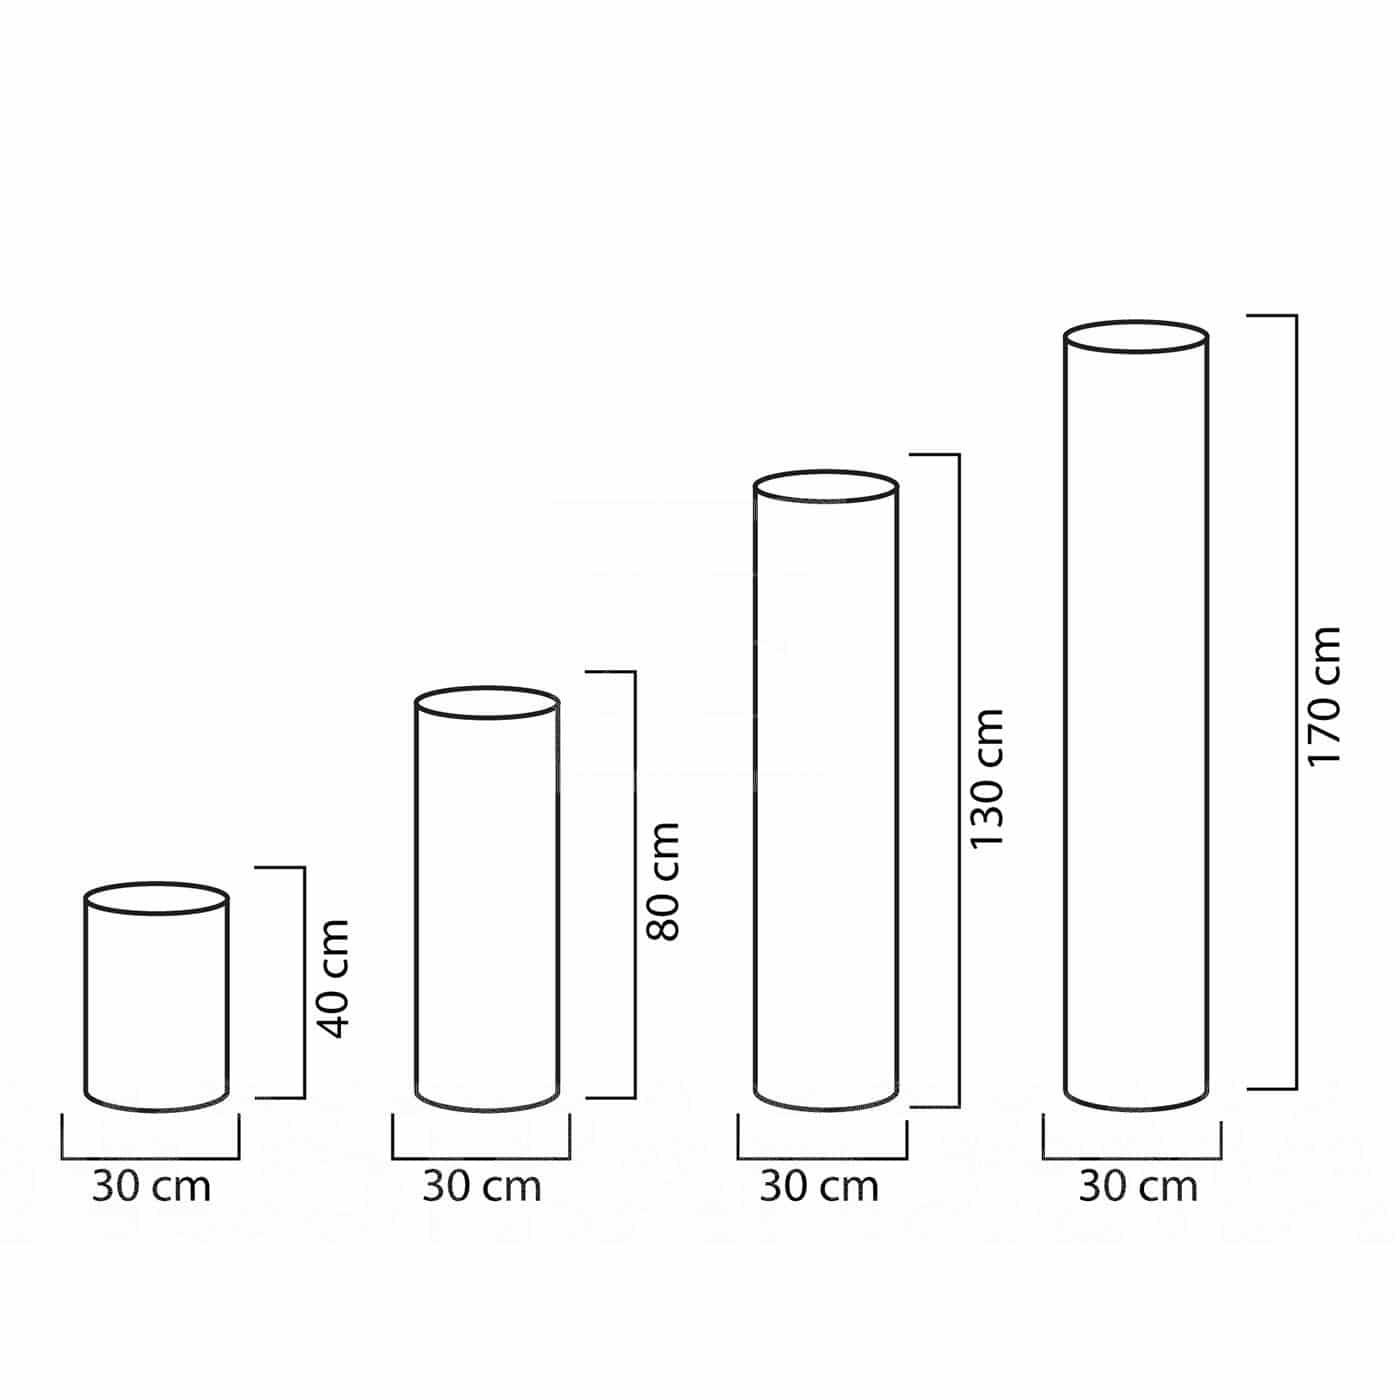 slide fluo runde leuchts ulen in 40 80 130 und 170 cm h he in outdoor. Black Bedroom Furniture Sets. Home Design Ideas